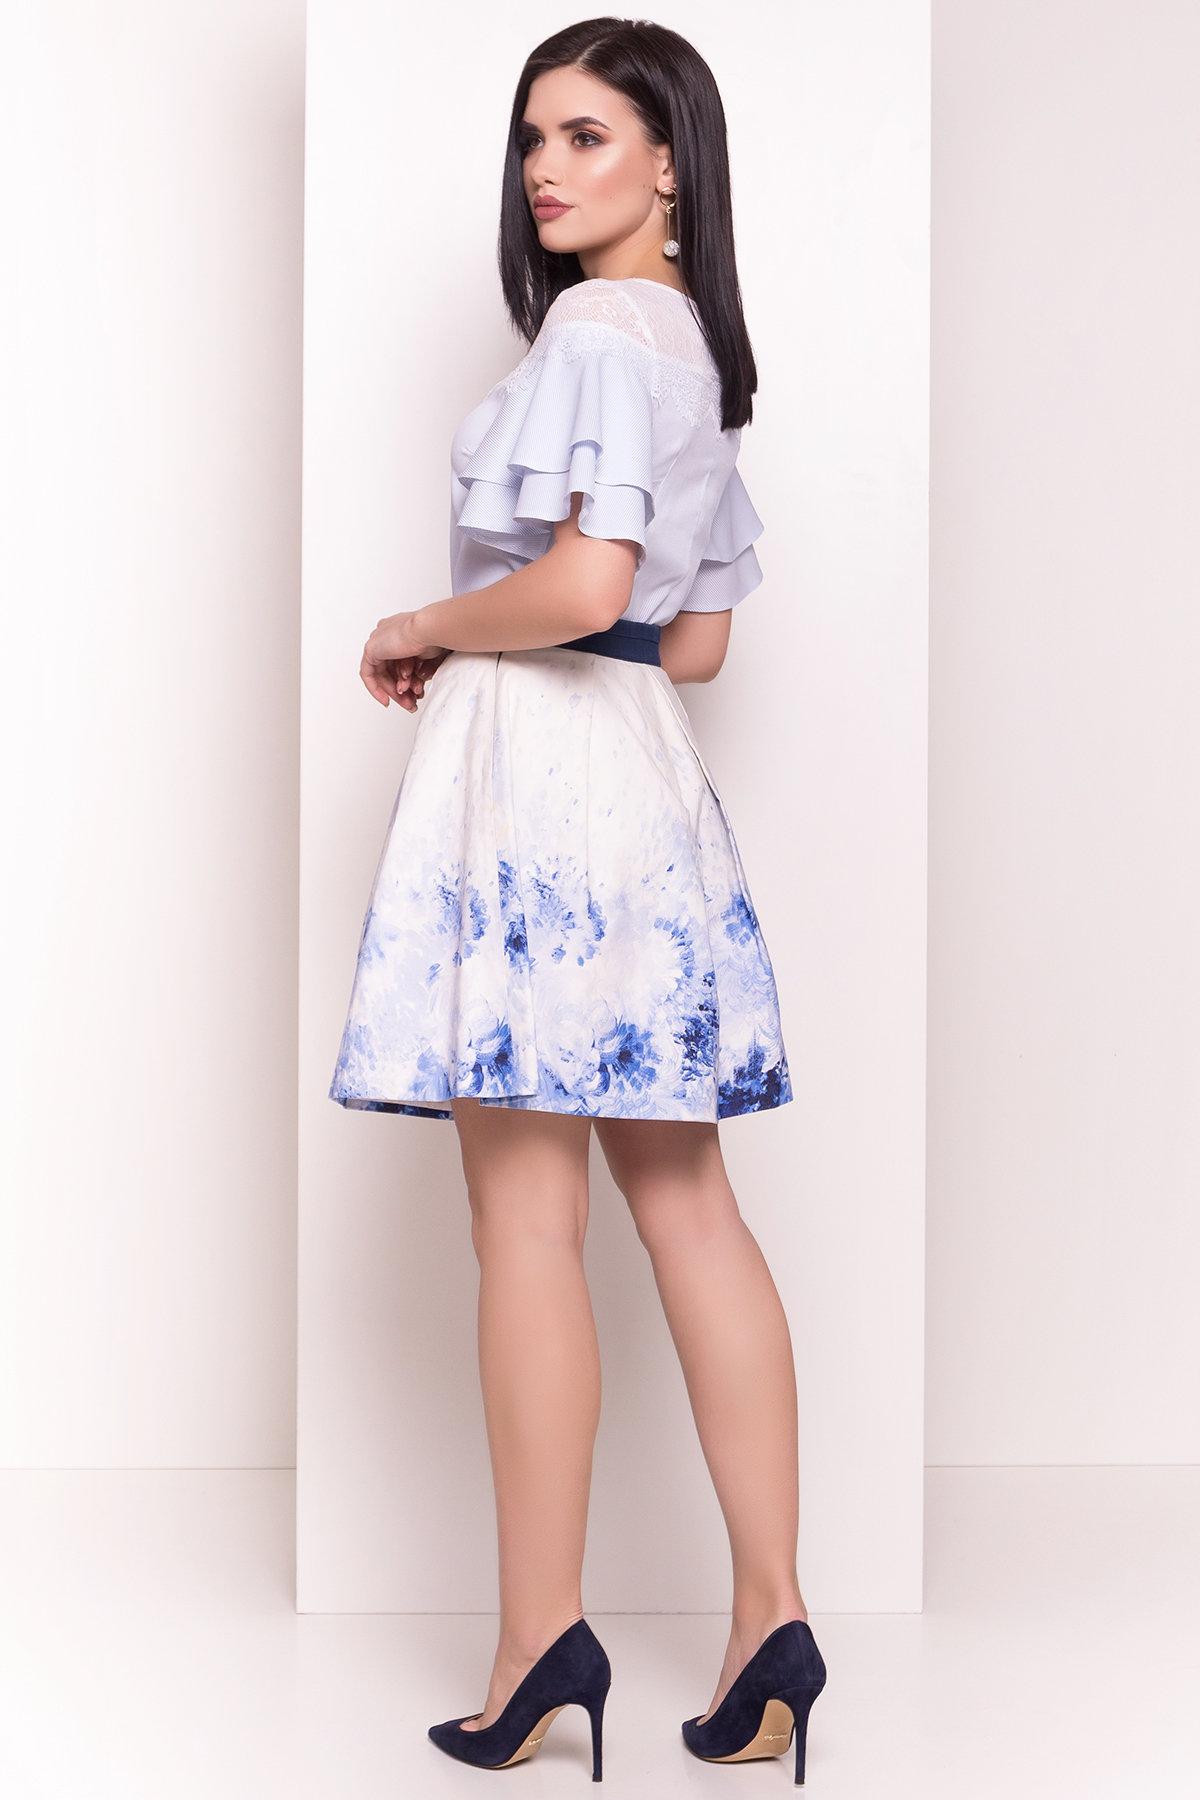 Блуза Ириска 4962 АРТ. 35090 Цвет: Голубой/белый - фото 3, интернет магазин tm-modus.ru